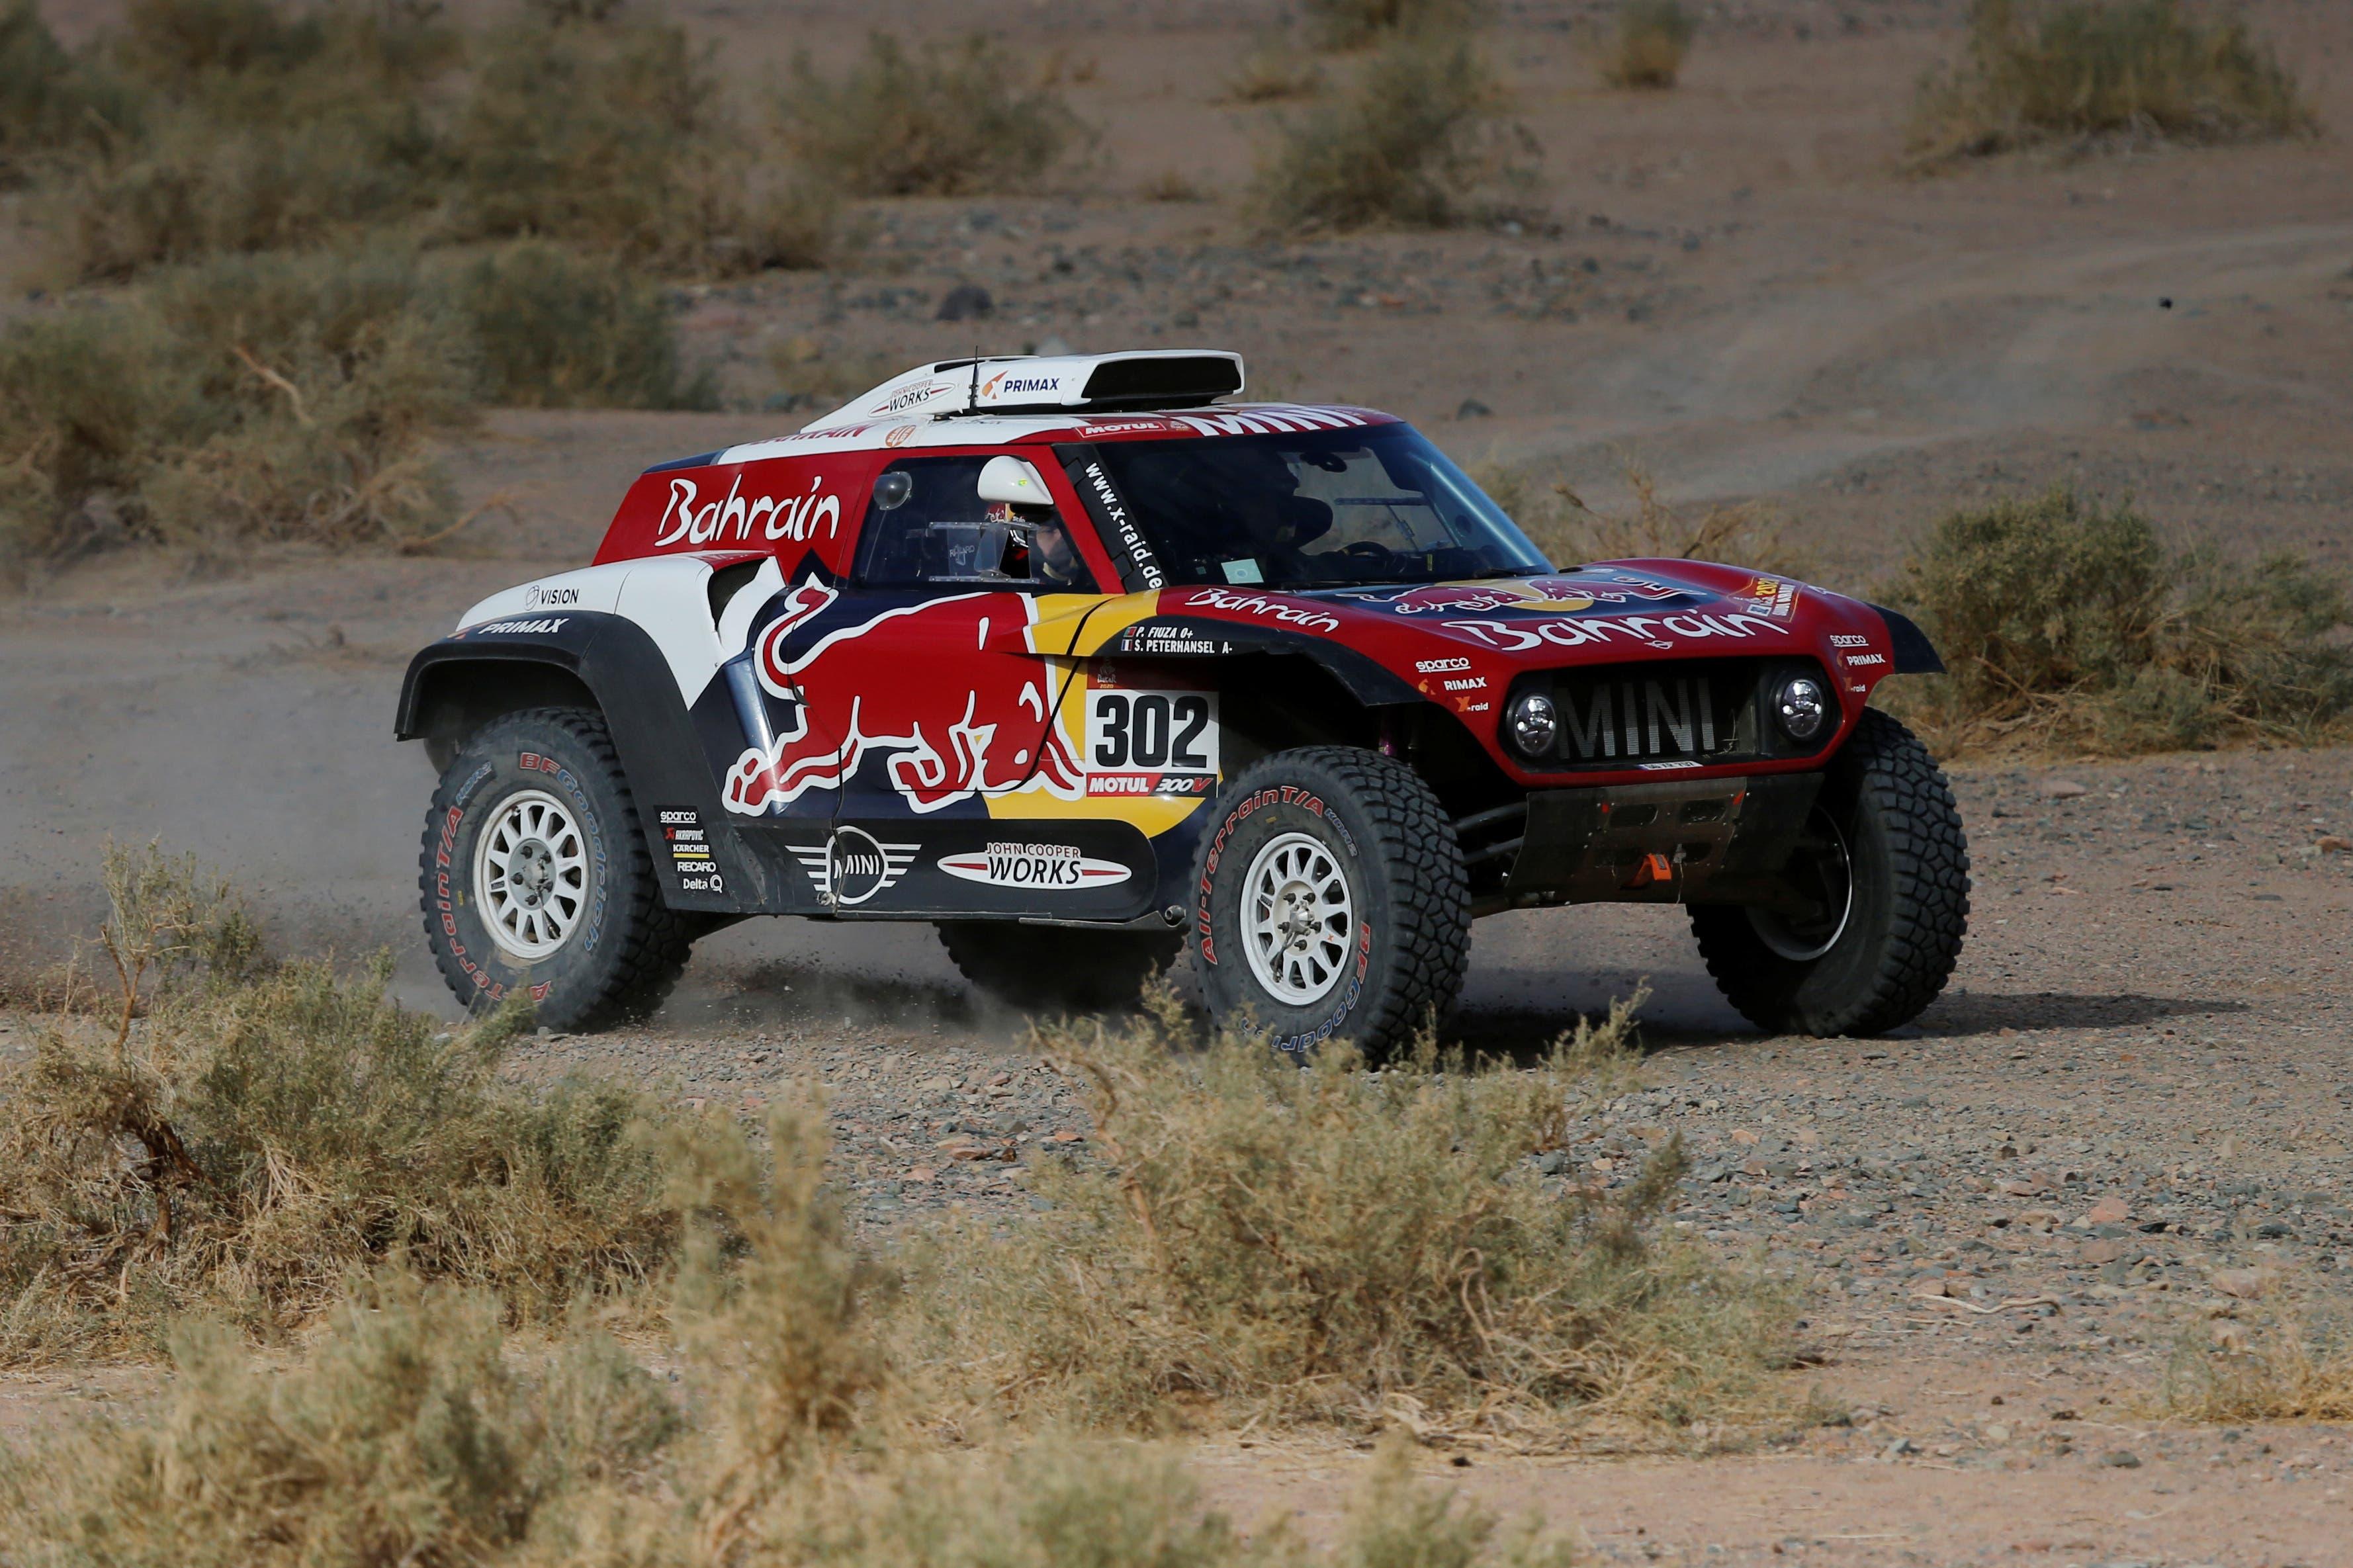 Dakar 2020: una cuarta etapa del Mar Rojo a las montañas y la ventaja de Sainz